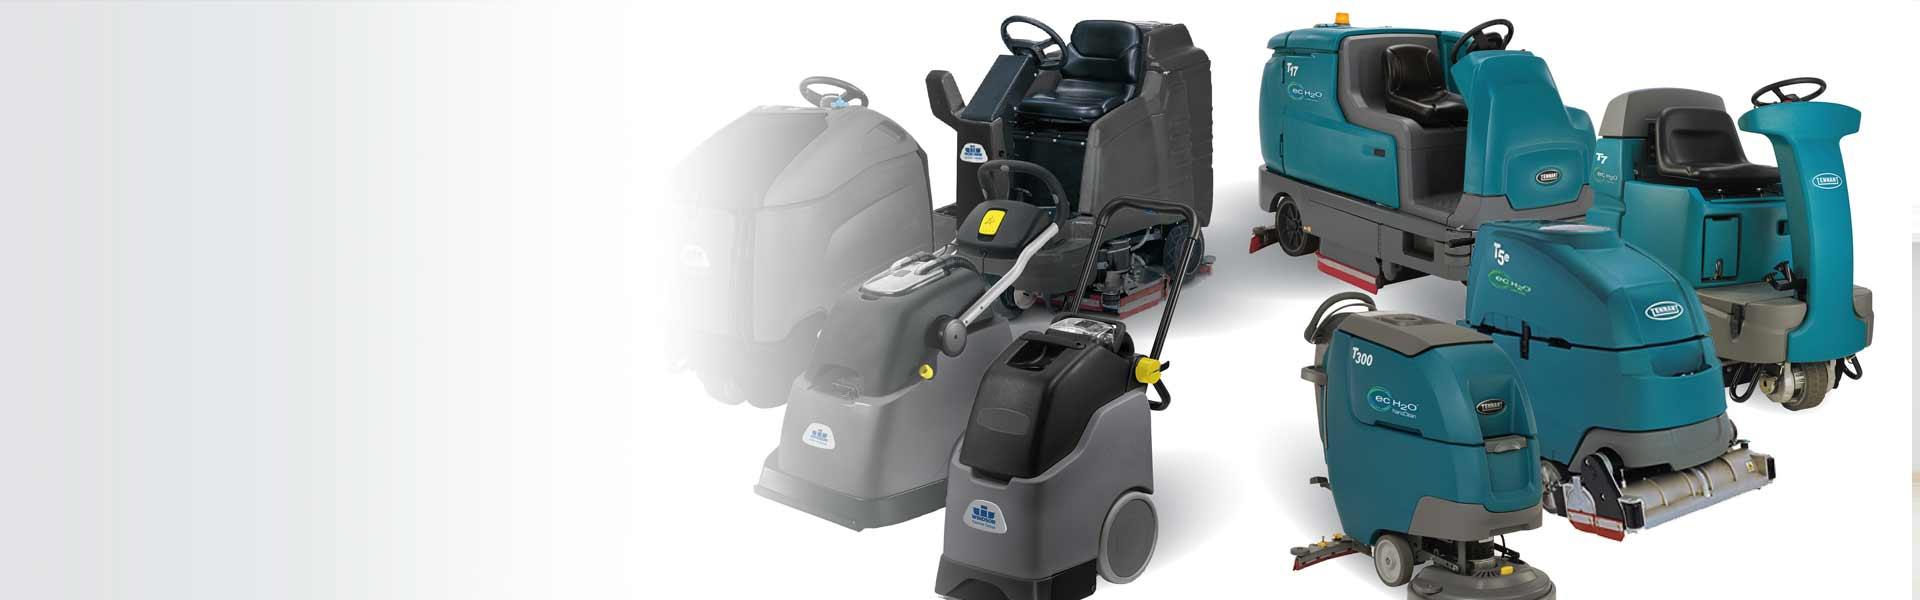 hp-billboard-cleaning-equipment